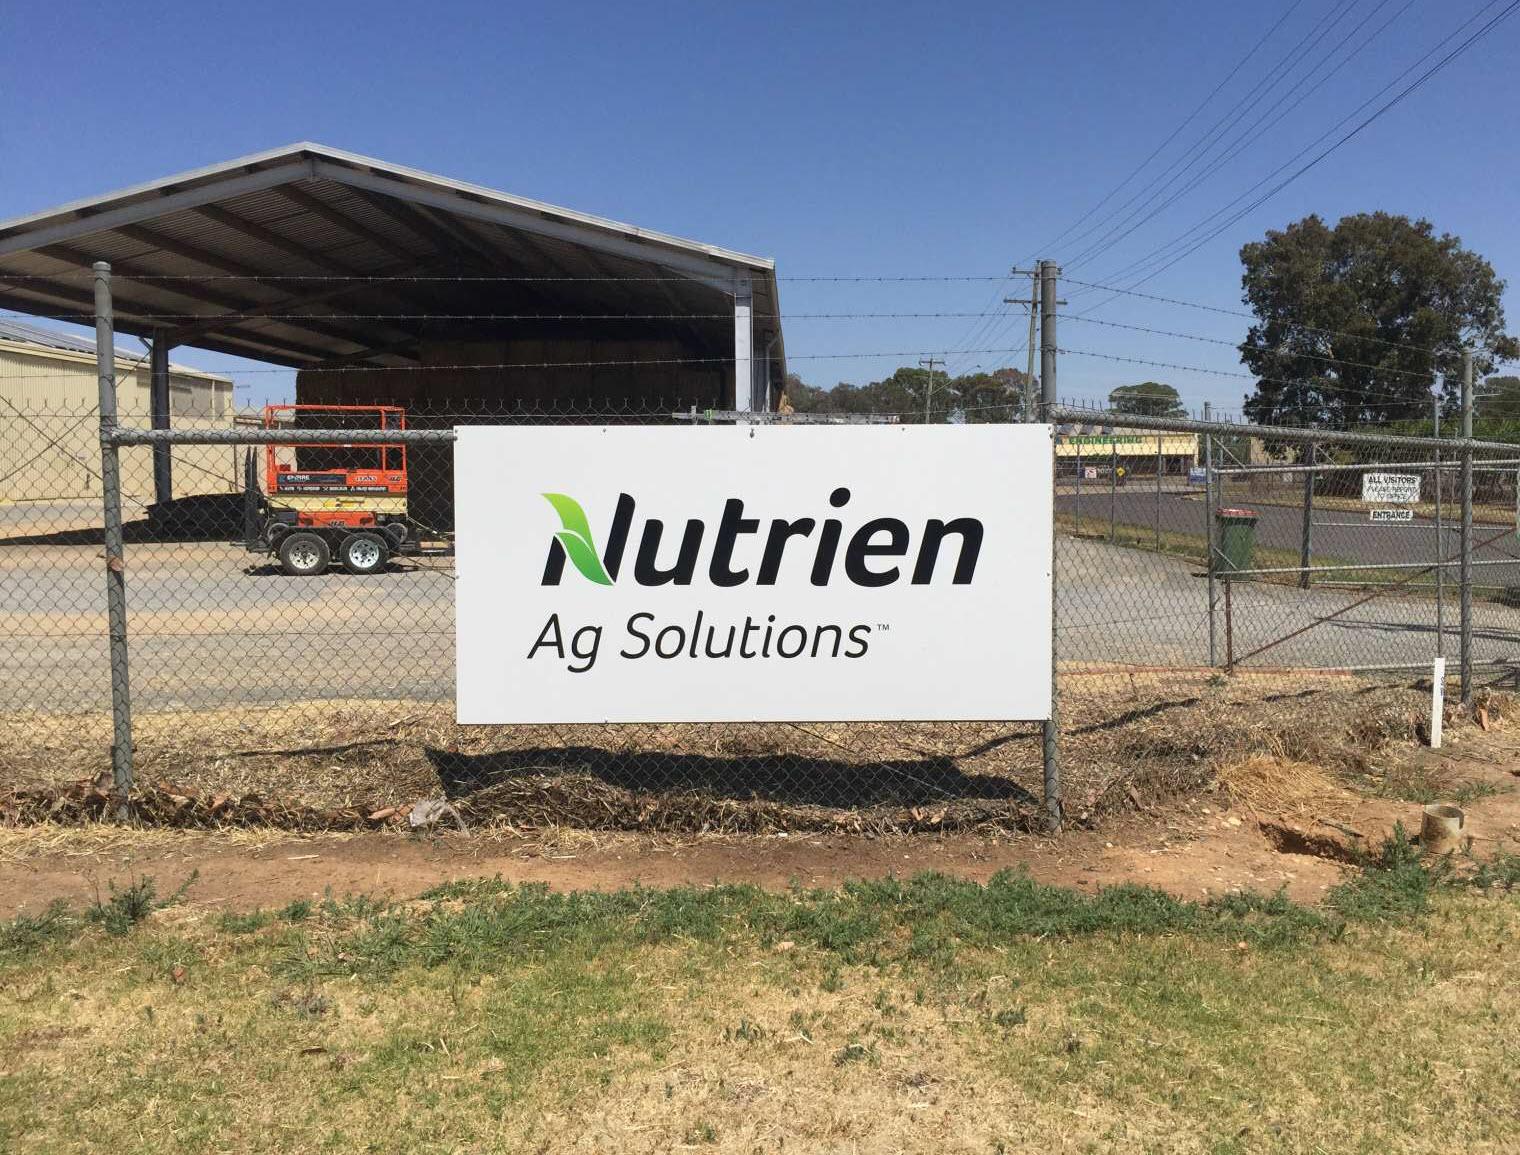 Nutrien Ag Solutions - Corowa, NSW 2646 - (02) 6025 1677 | ShowMeLocal.com